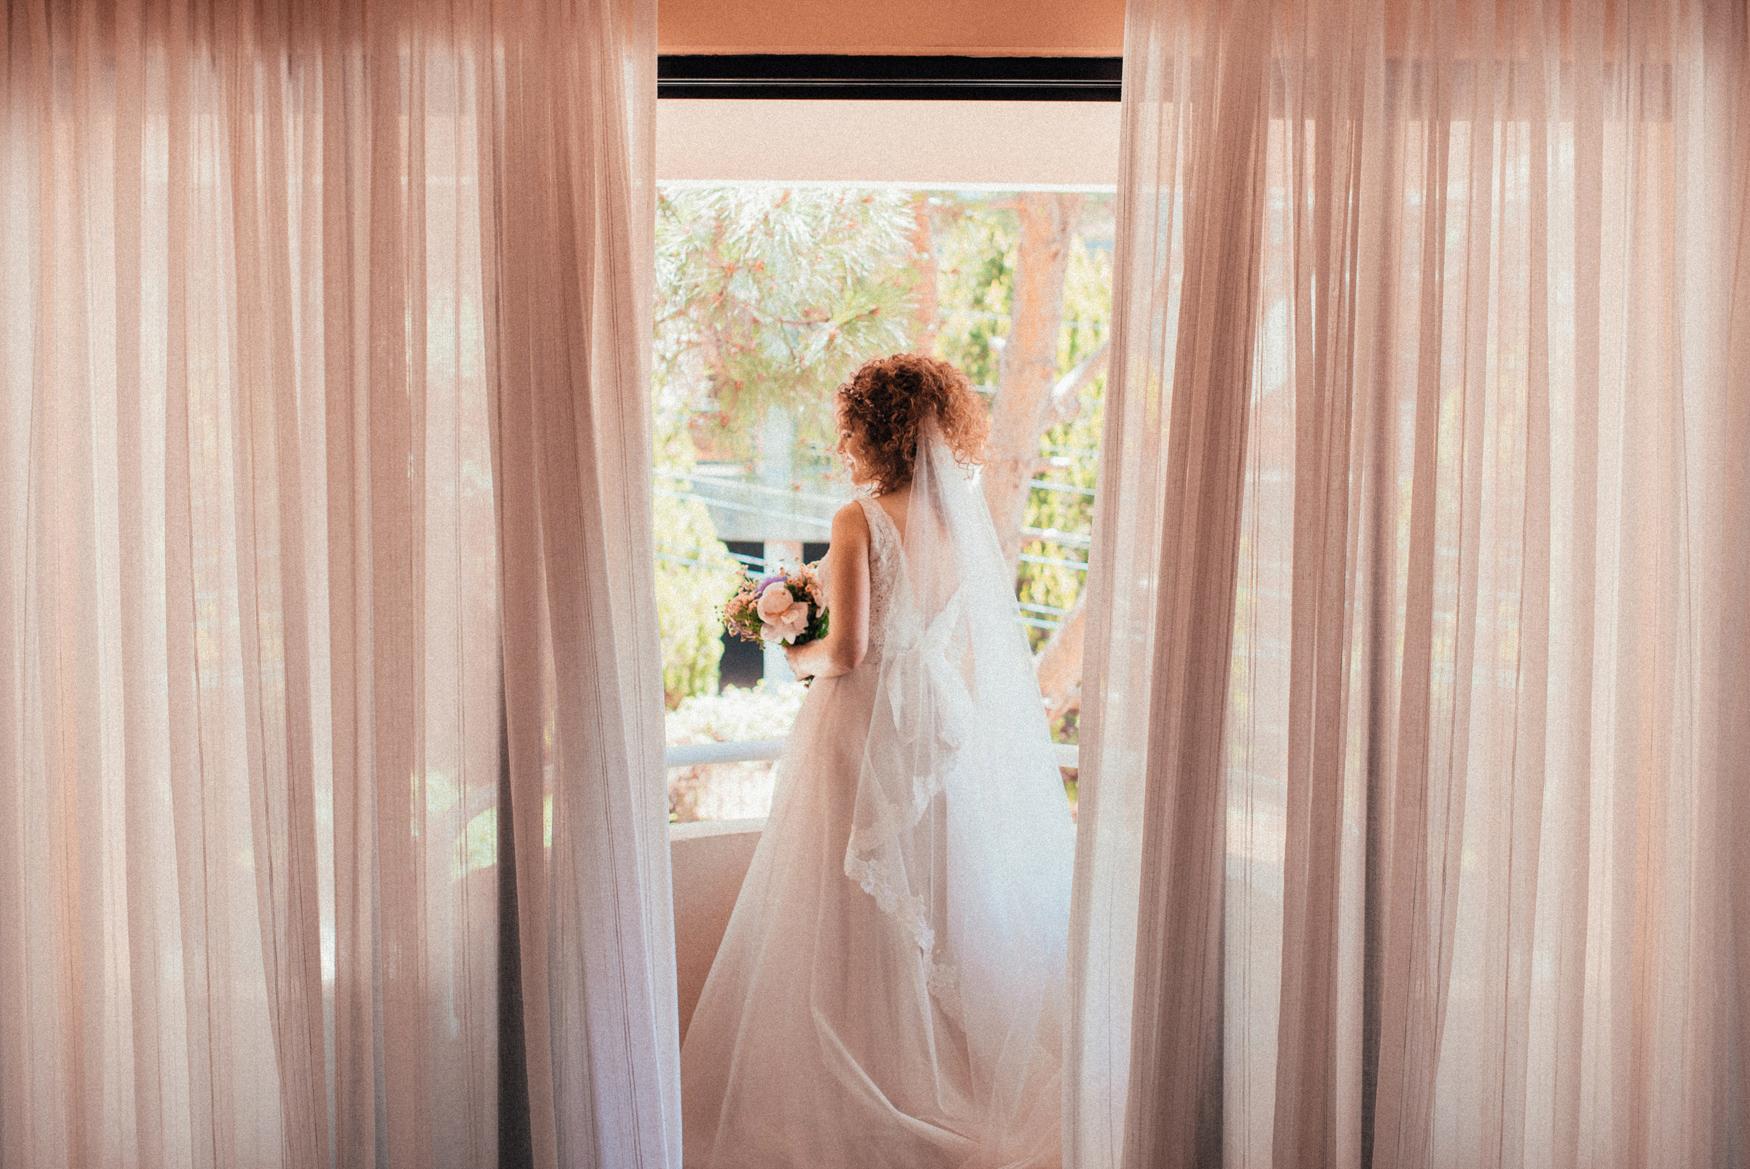 LR2 beirut byblos wedding photographer lebanon 018.jpg